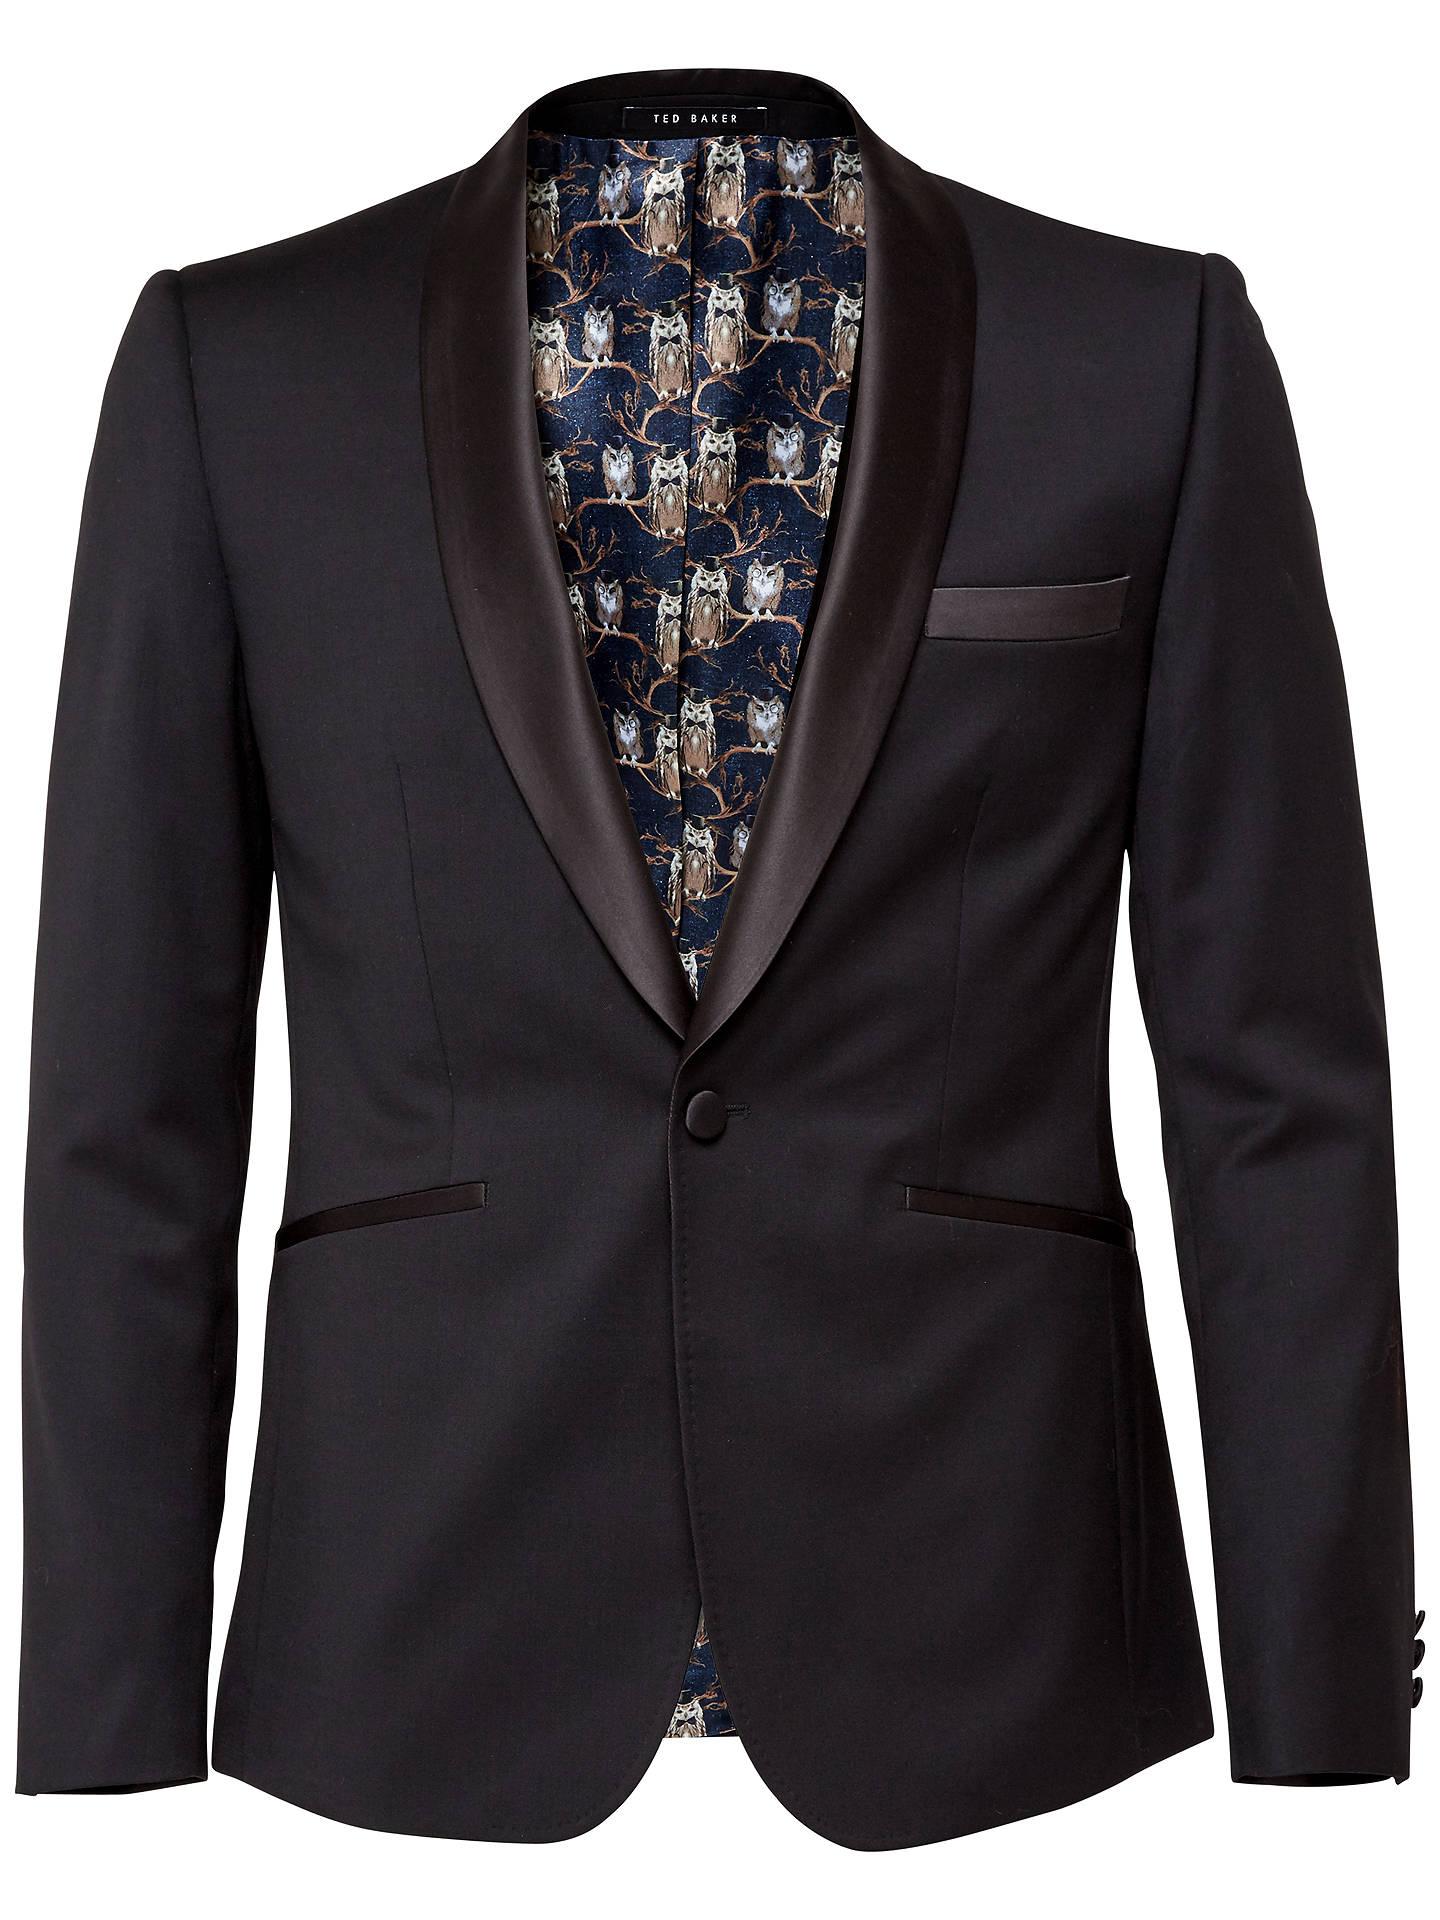 6e491bd9837 Buy Ted Baker Twilitj Tailored Wool Dinner Jacket, Black, 38S Online at  johnlewis.